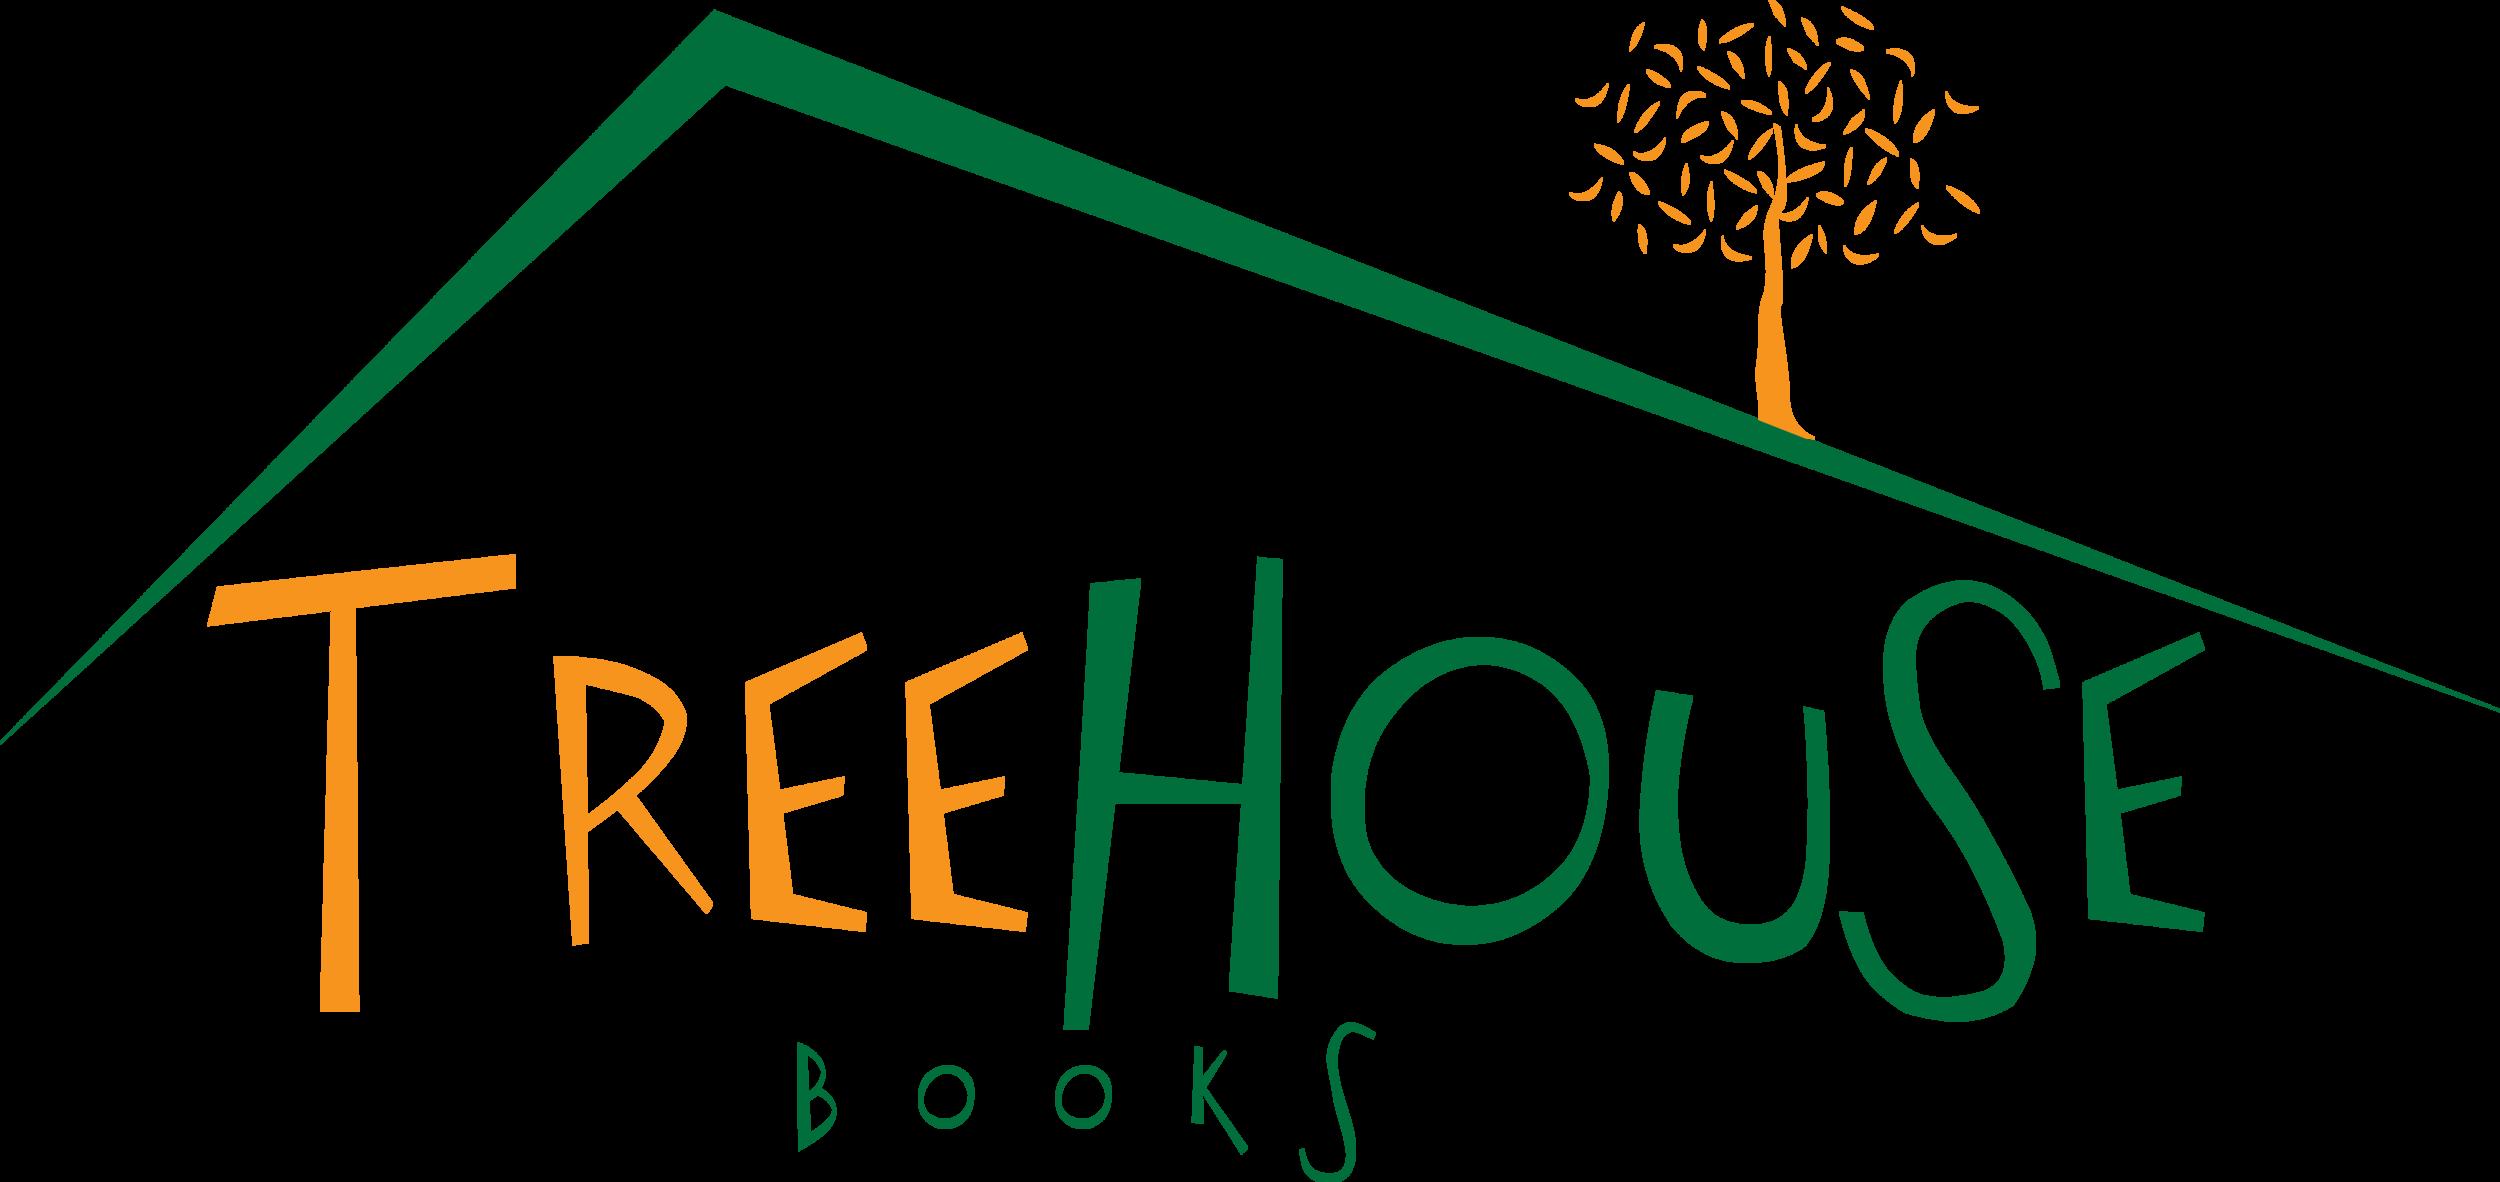 treehouselogo